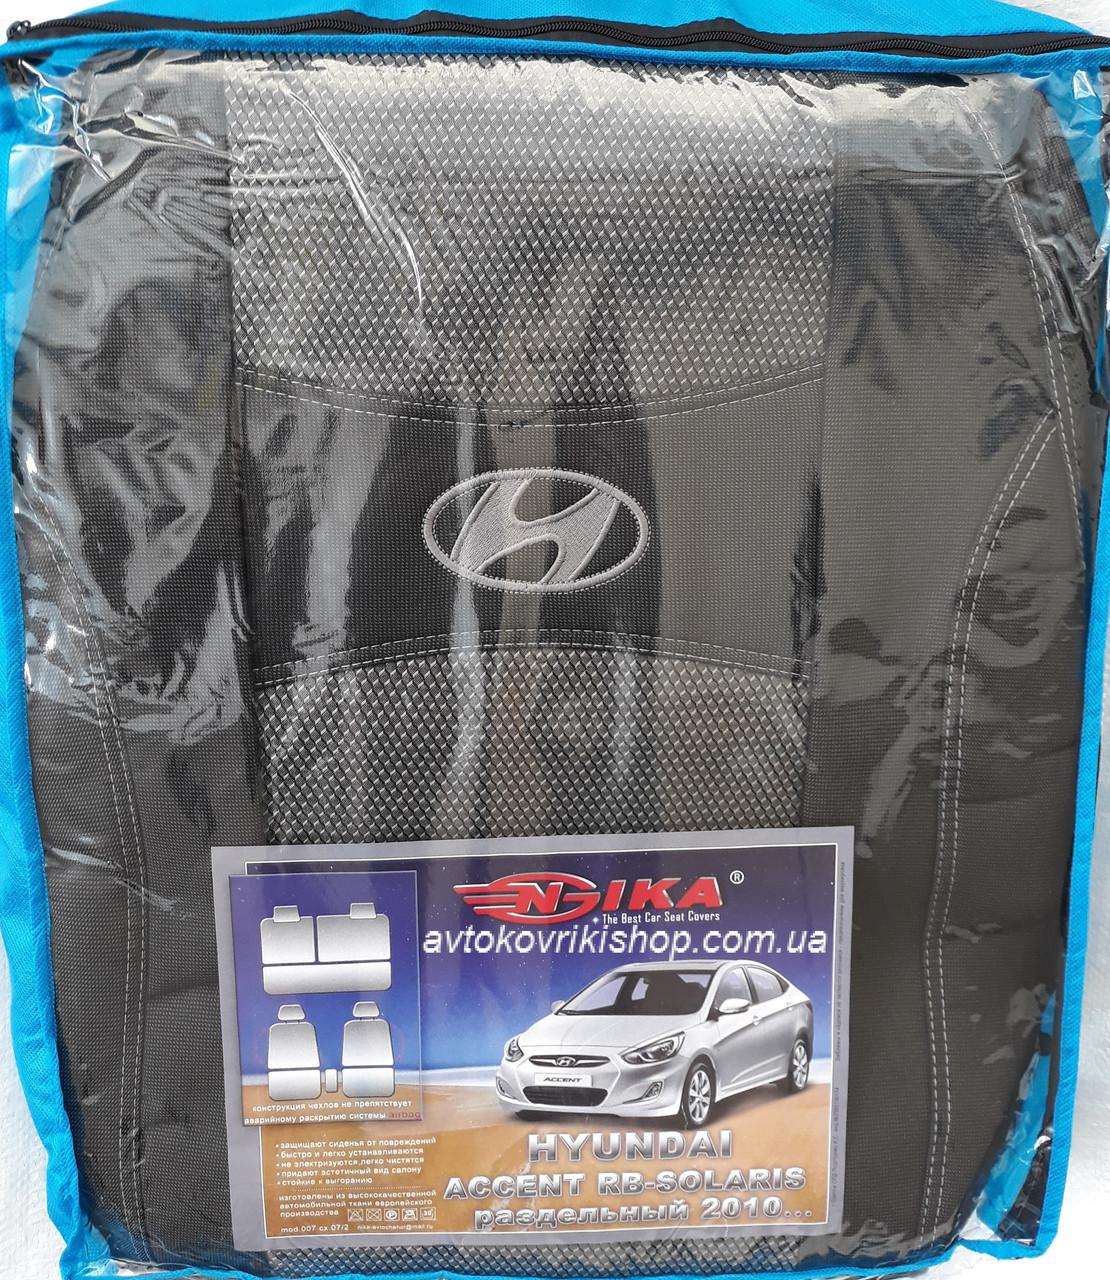 Авточохли Hyundai Accent 2010- / Solaris 2010 - Nika